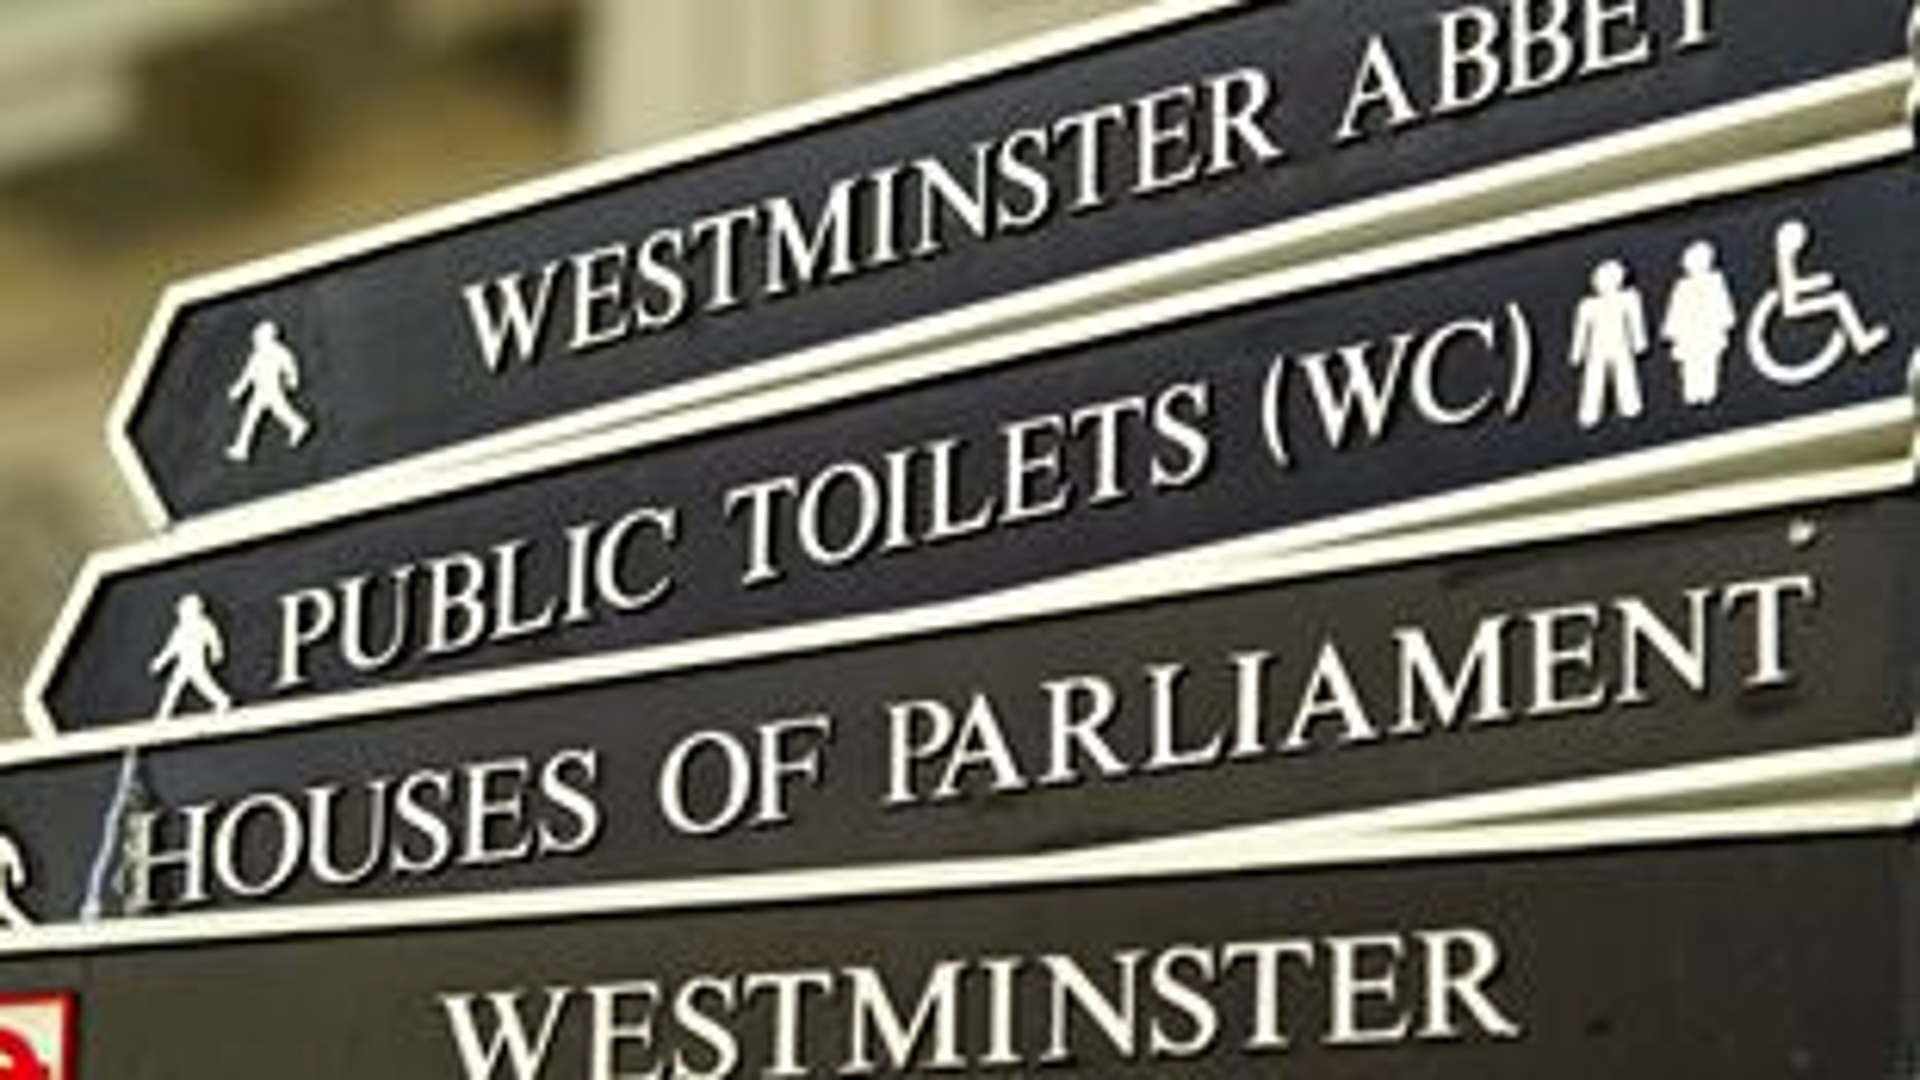 London toilets